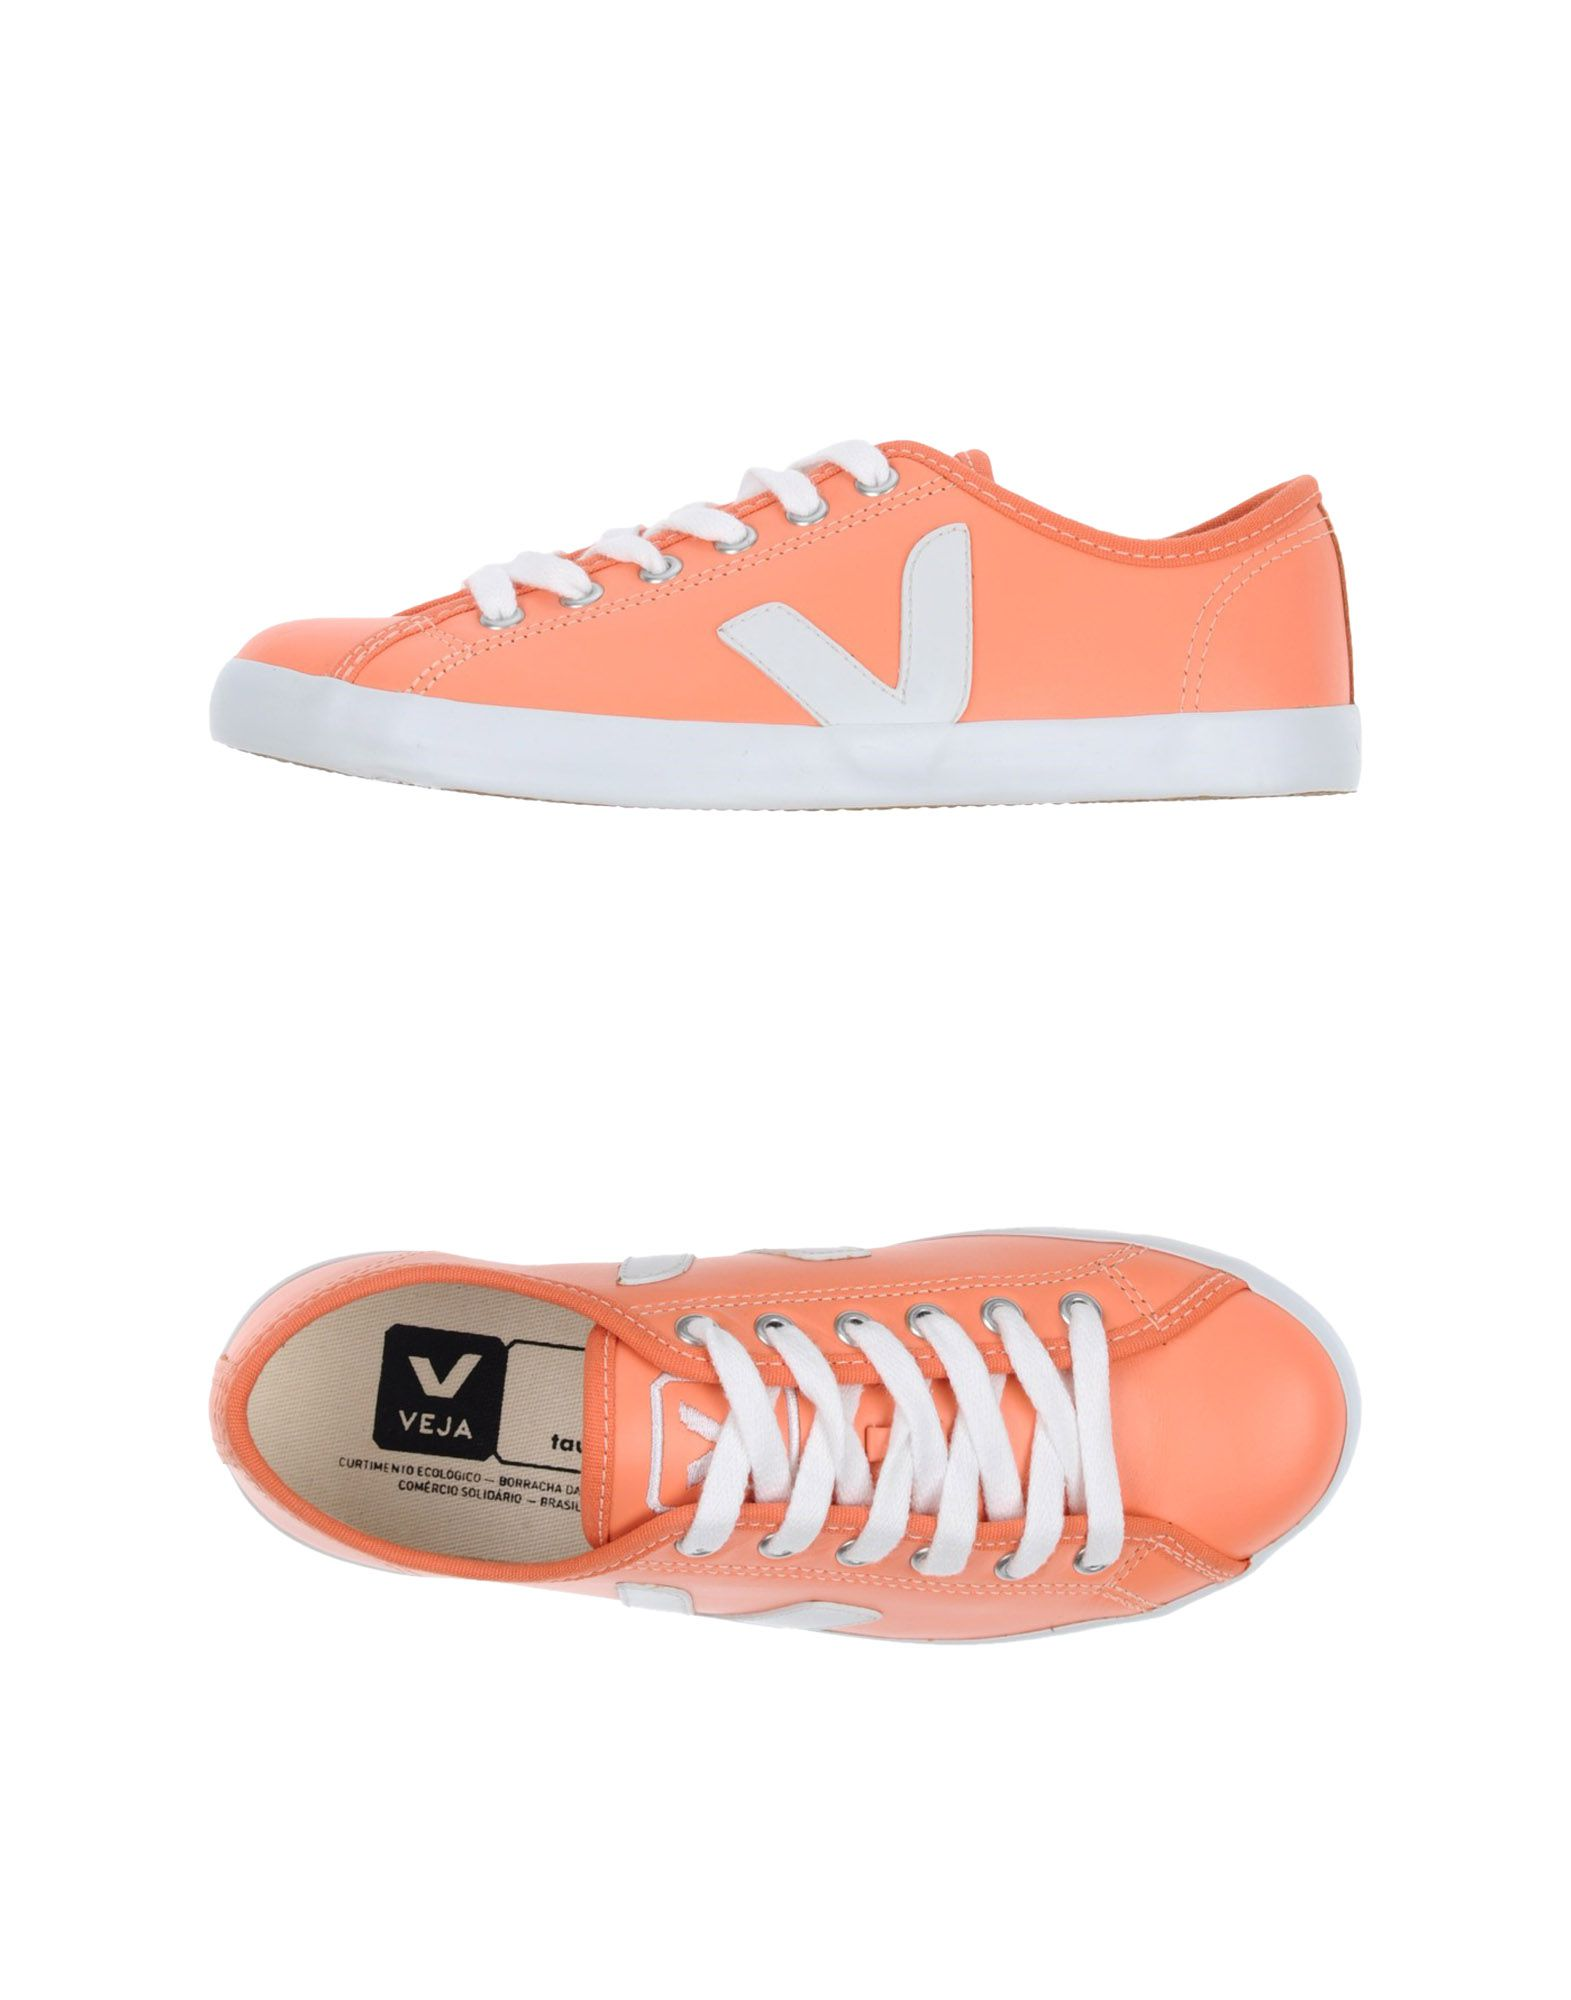 Veja Sneakers - Women  Veja Sneakers online on  Women Australia - 44777552QC 71139d